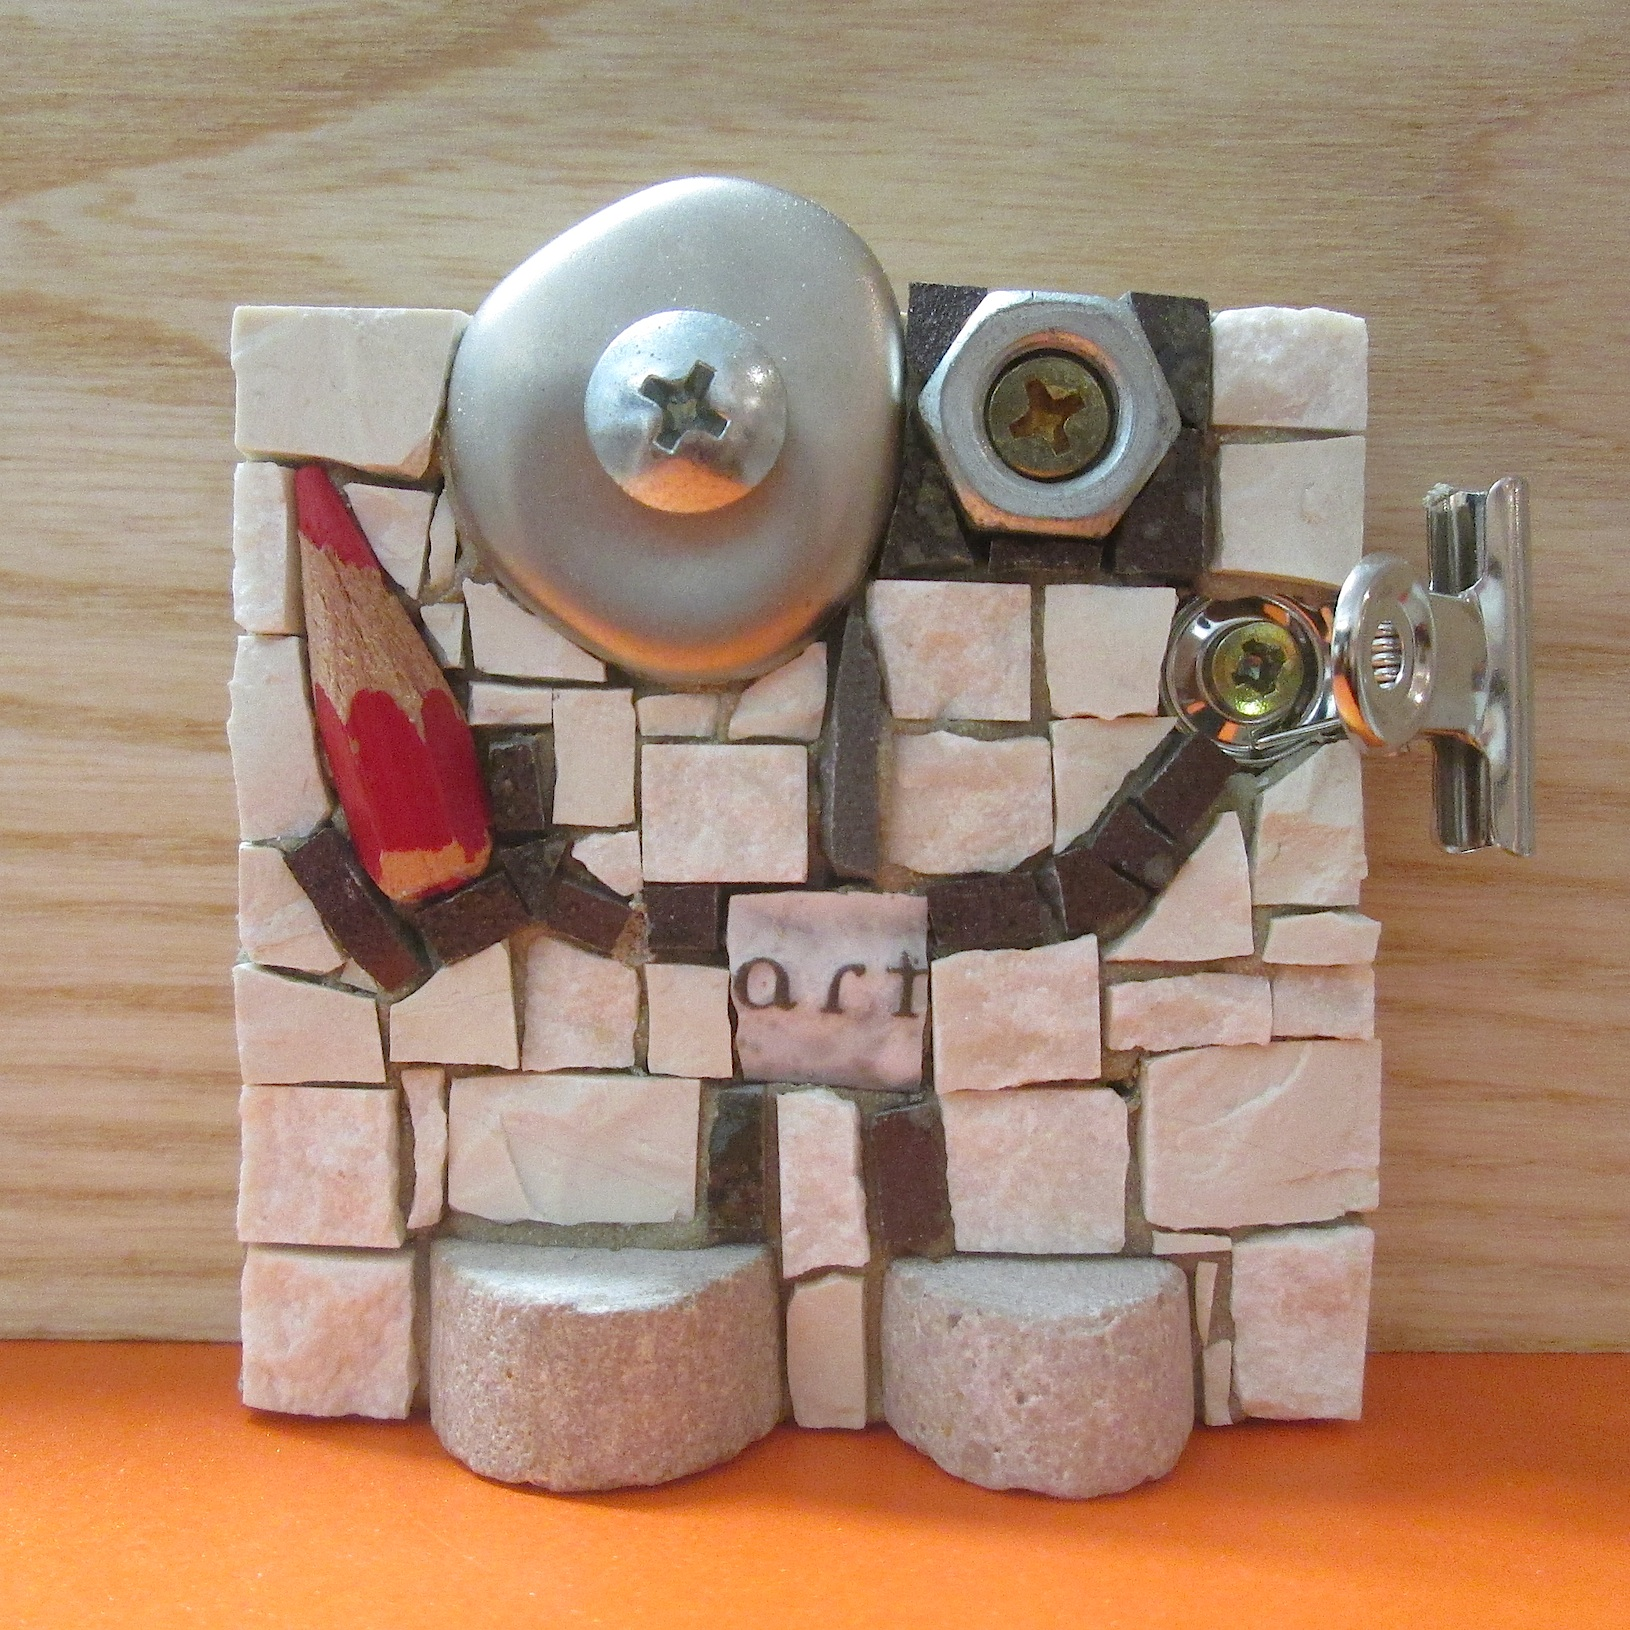 Art, Funny robot